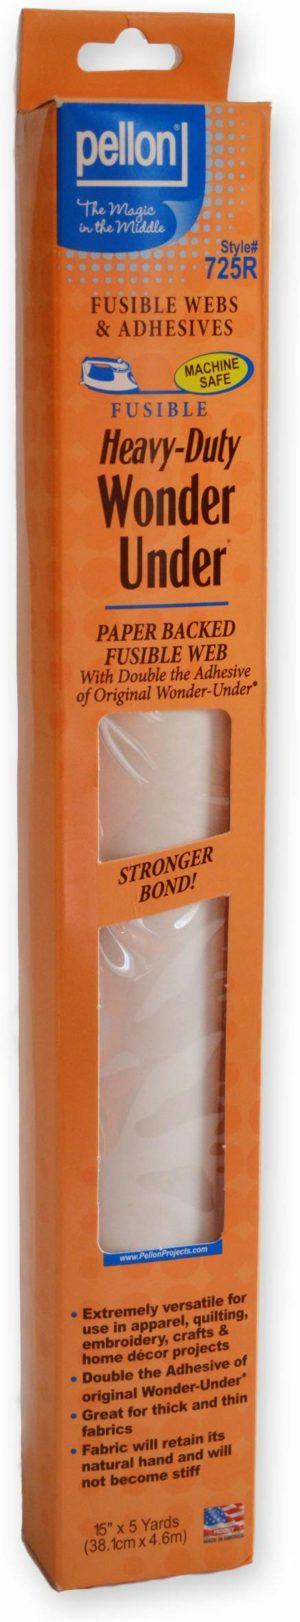 Wonder Under Fusible Web White 15 inch x 2 Yard Bulk Buy (3-Pack)